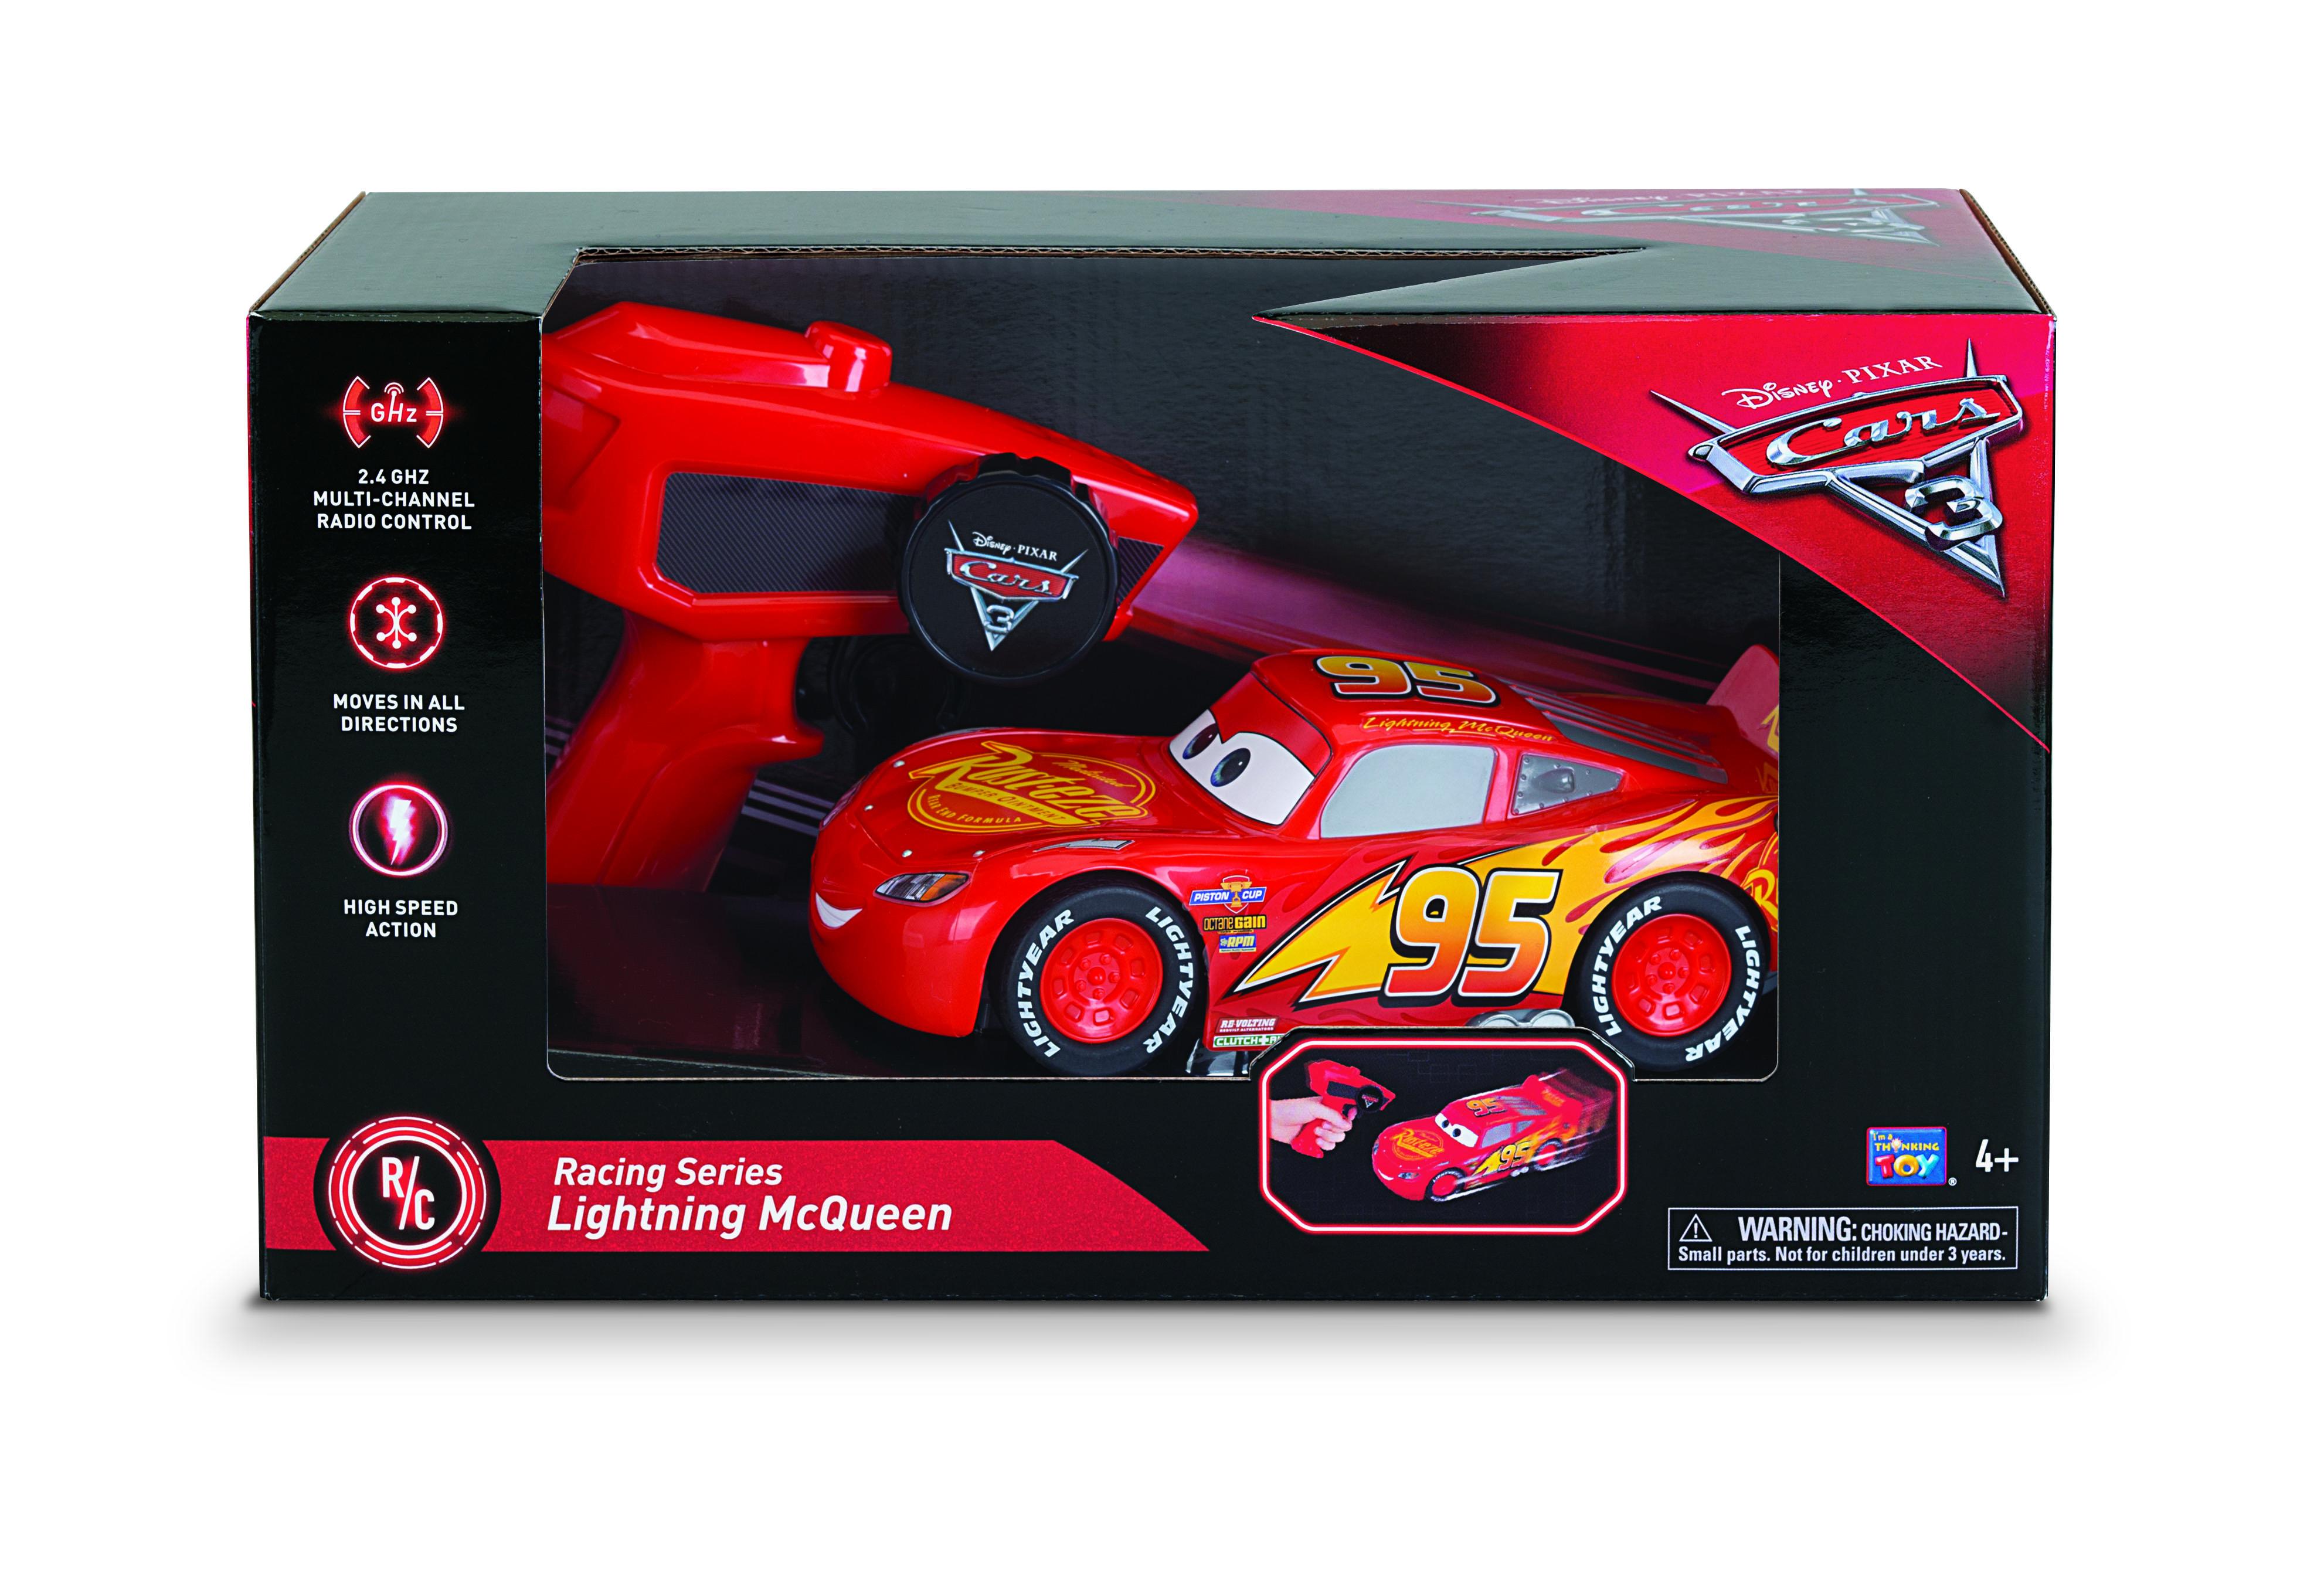 Cars 3 Racing Series Lightning McQueen